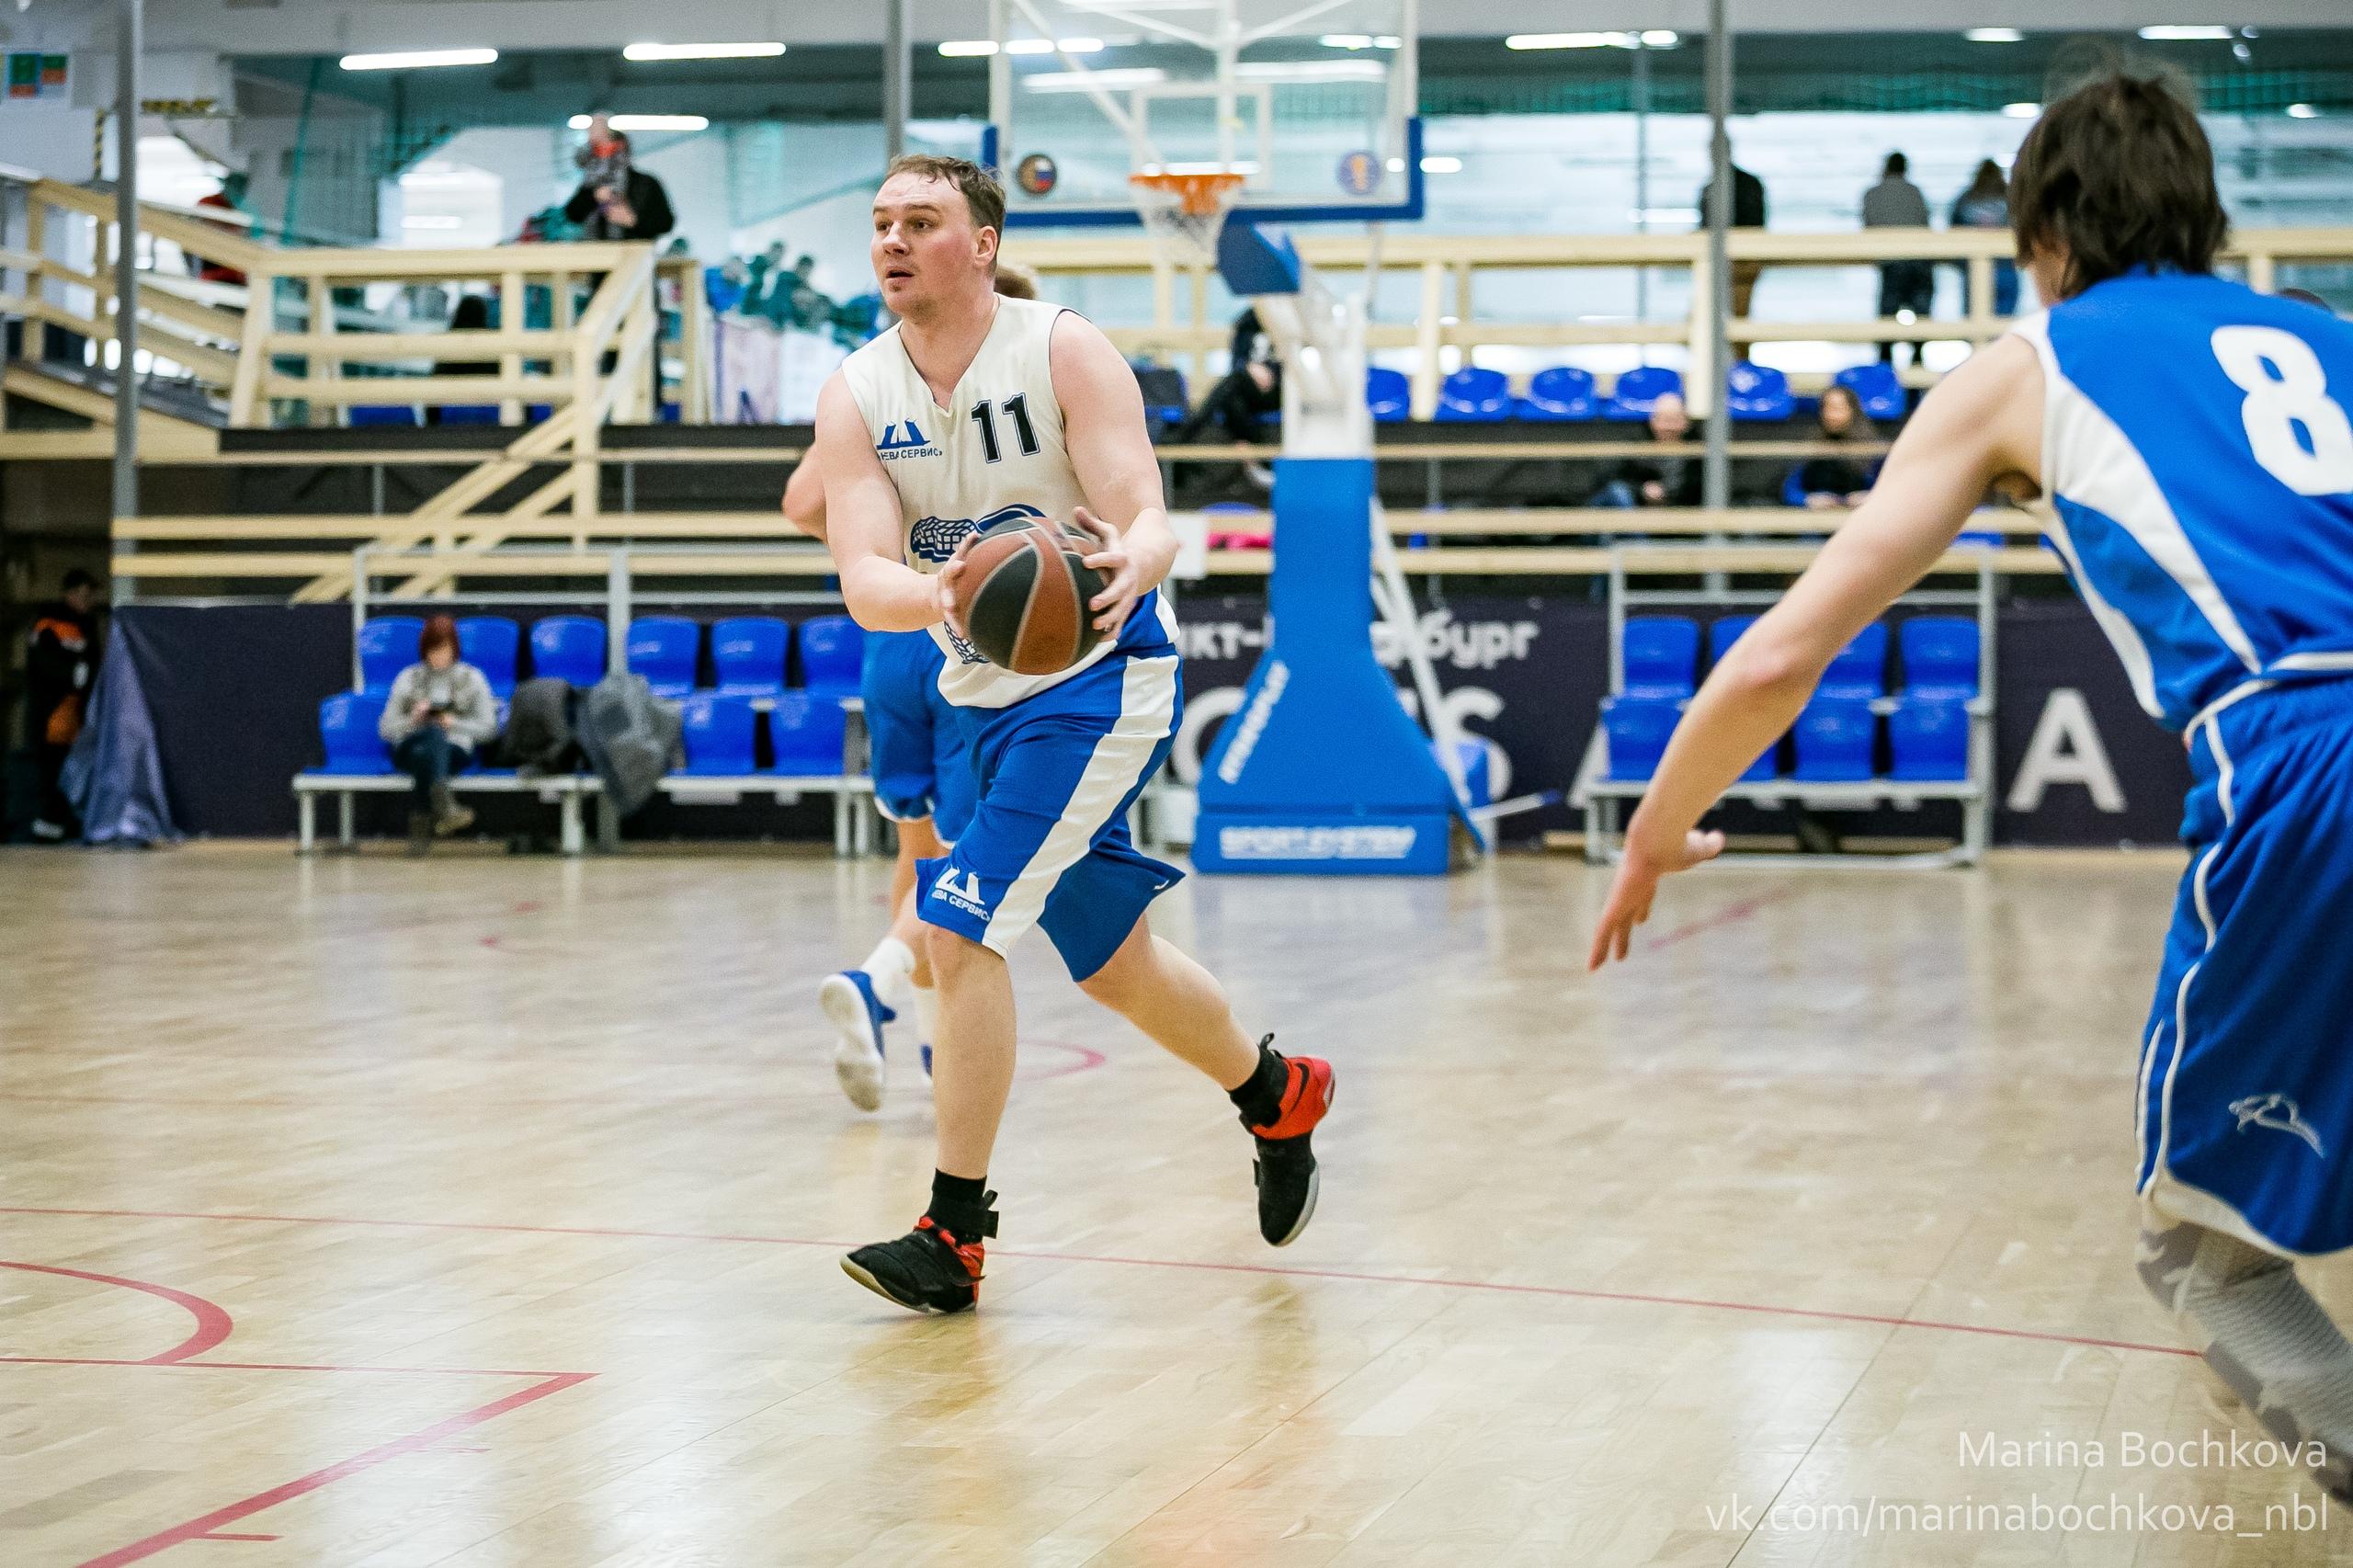 Игорь Столицин